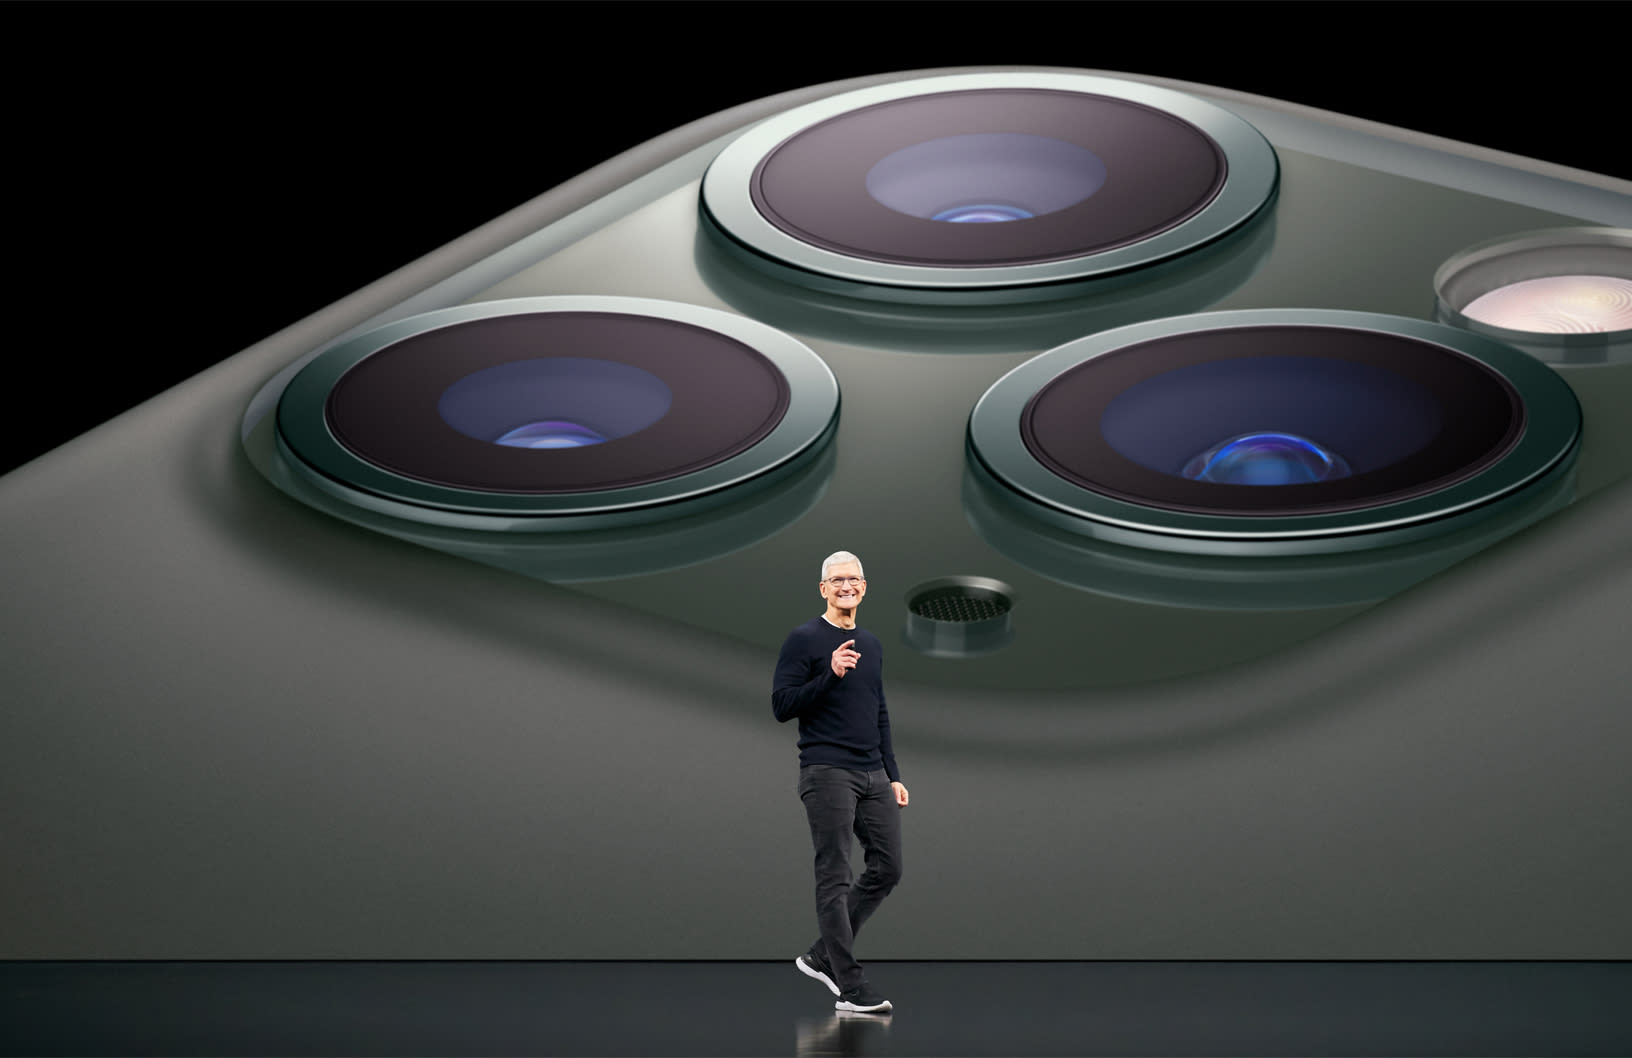 iphone-update-apple-set-to-equip-future-iphones-with-periscope-lens-20200722-1